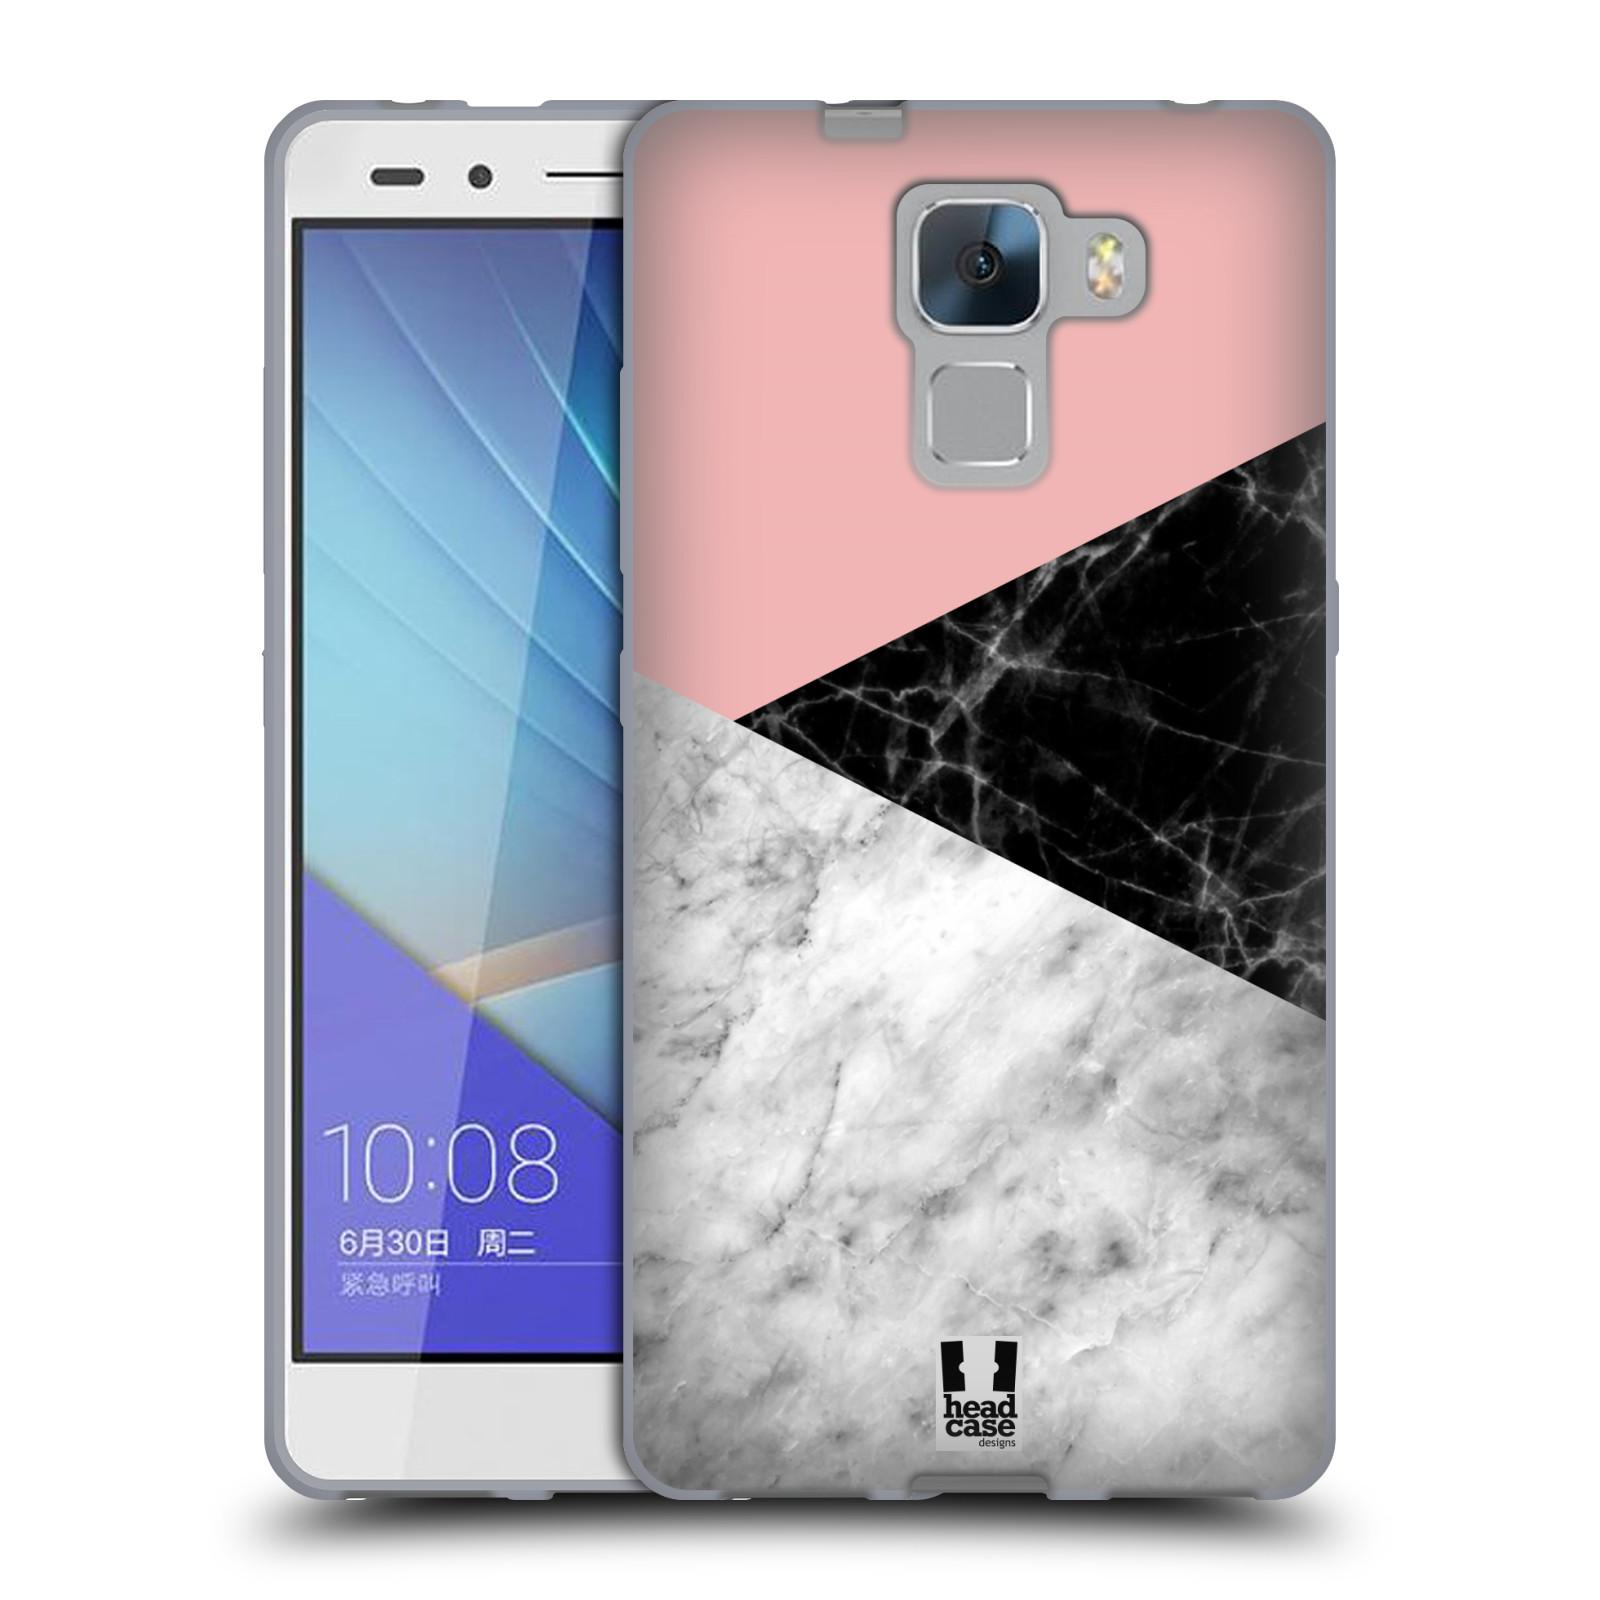 Silikonové pouzdro na mobil Honor 7 - Head Case - Mramor mix